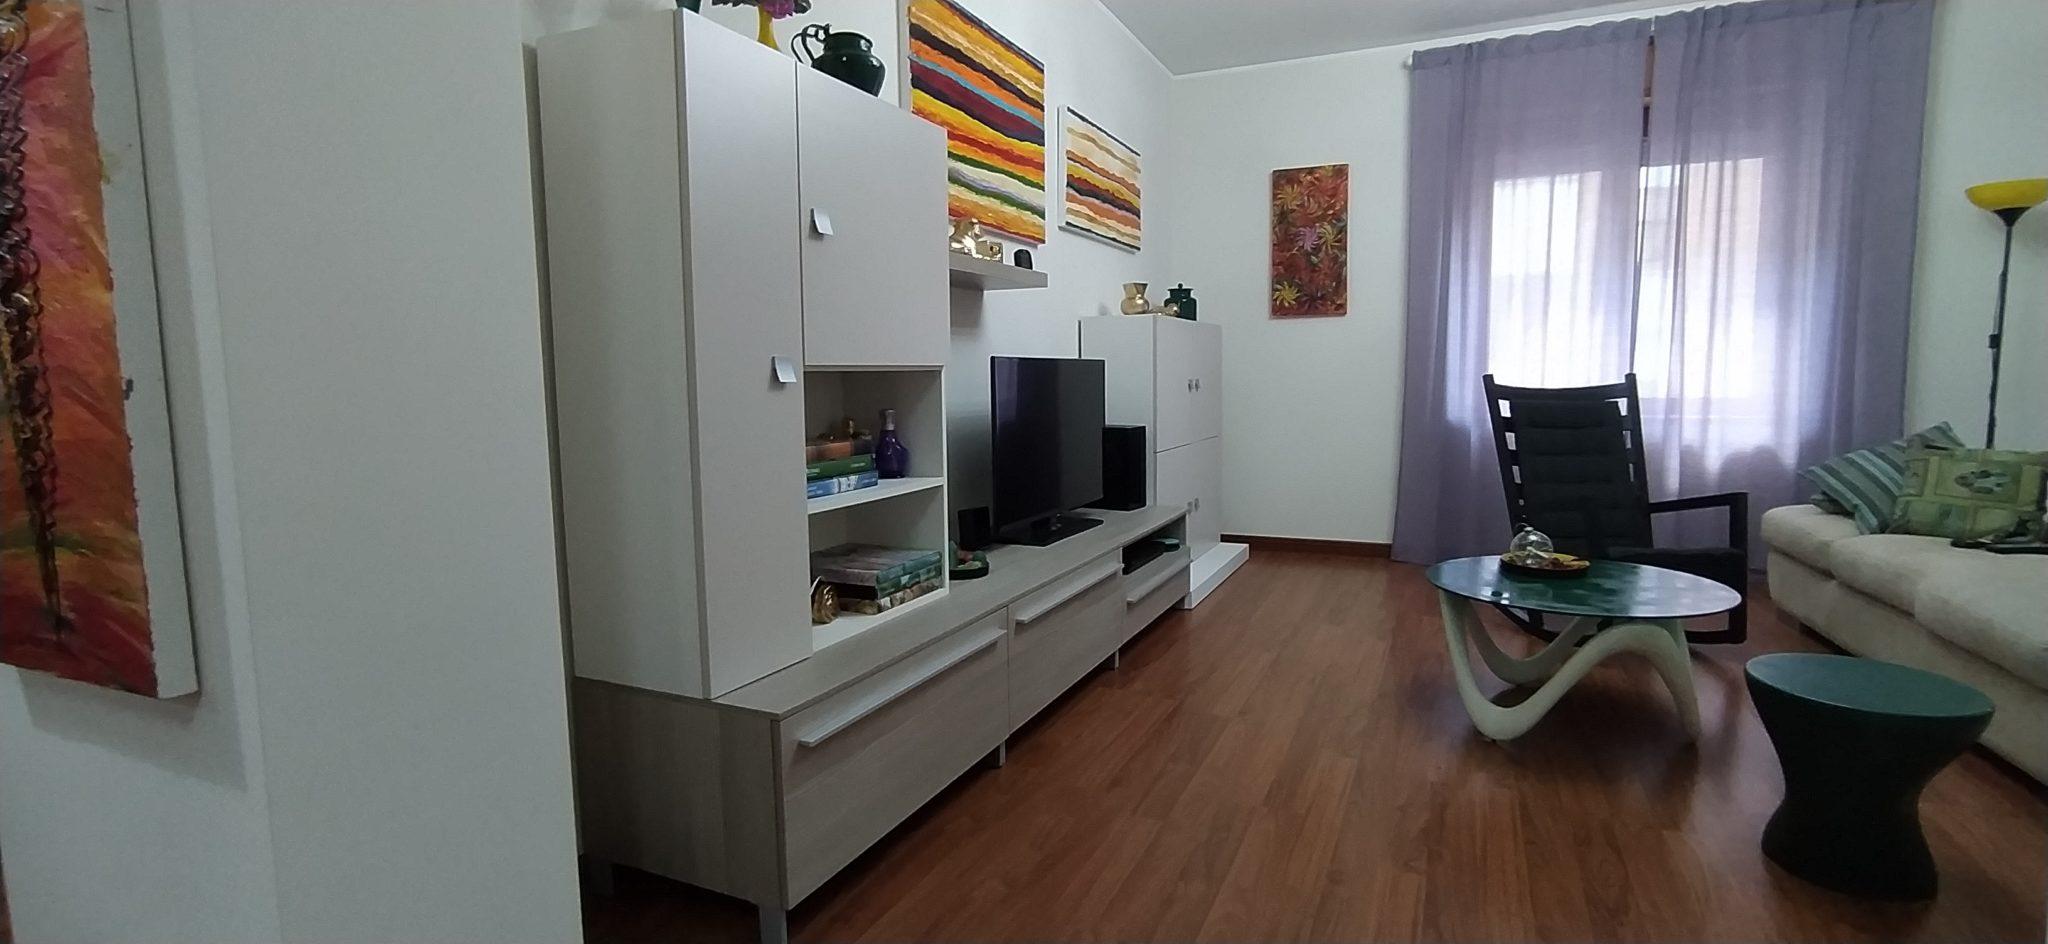 Appartamento in Via Nicola Sole